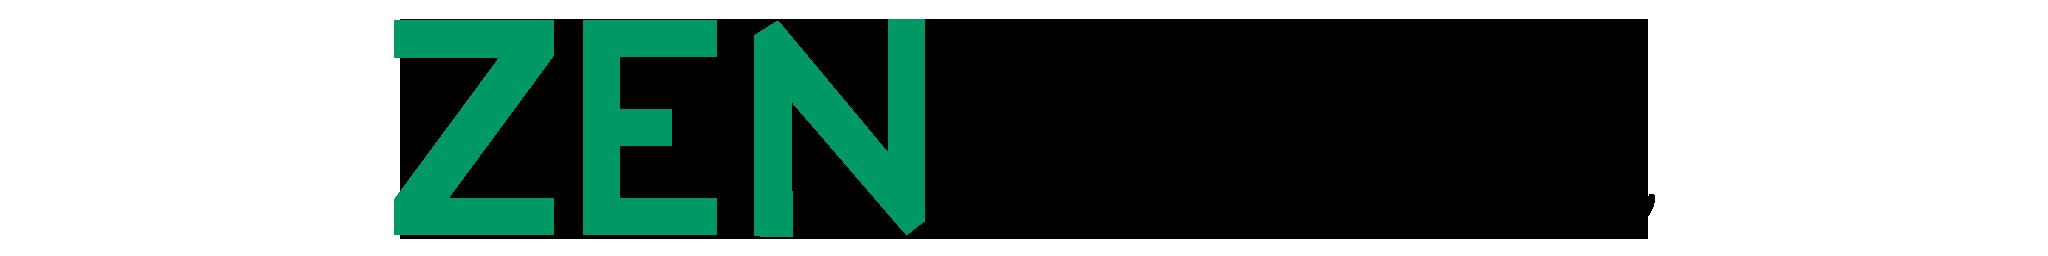 zen hustlers logo horizontal 1.png